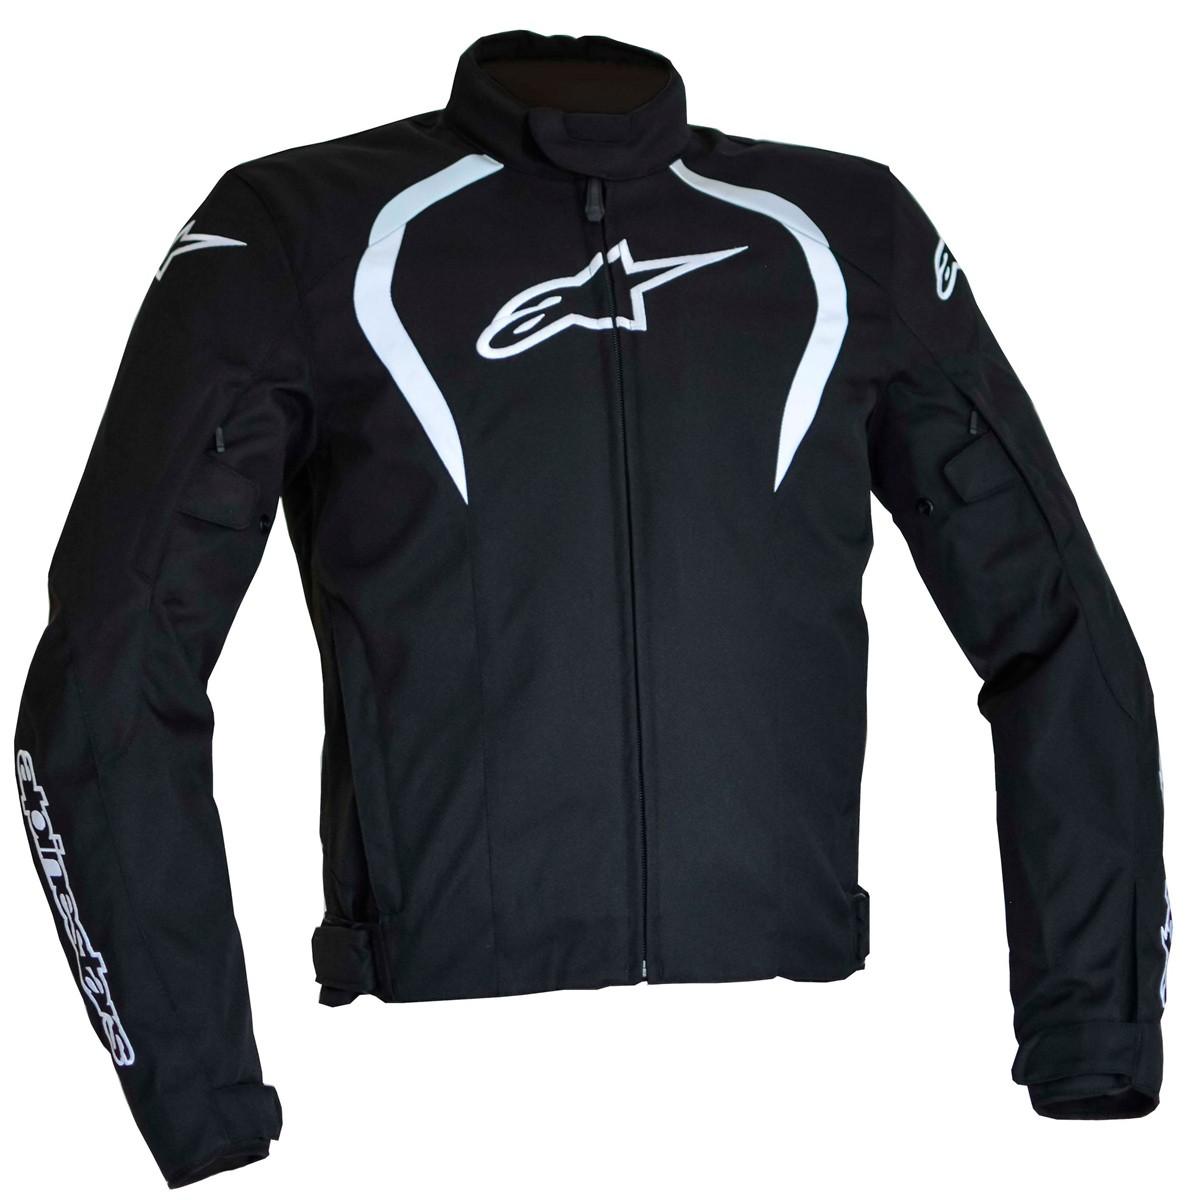 Jaqueta Alpinestars Alux WP (Black) - LANÇAMENTO  - Nova Suzuki Motos e Acessórios